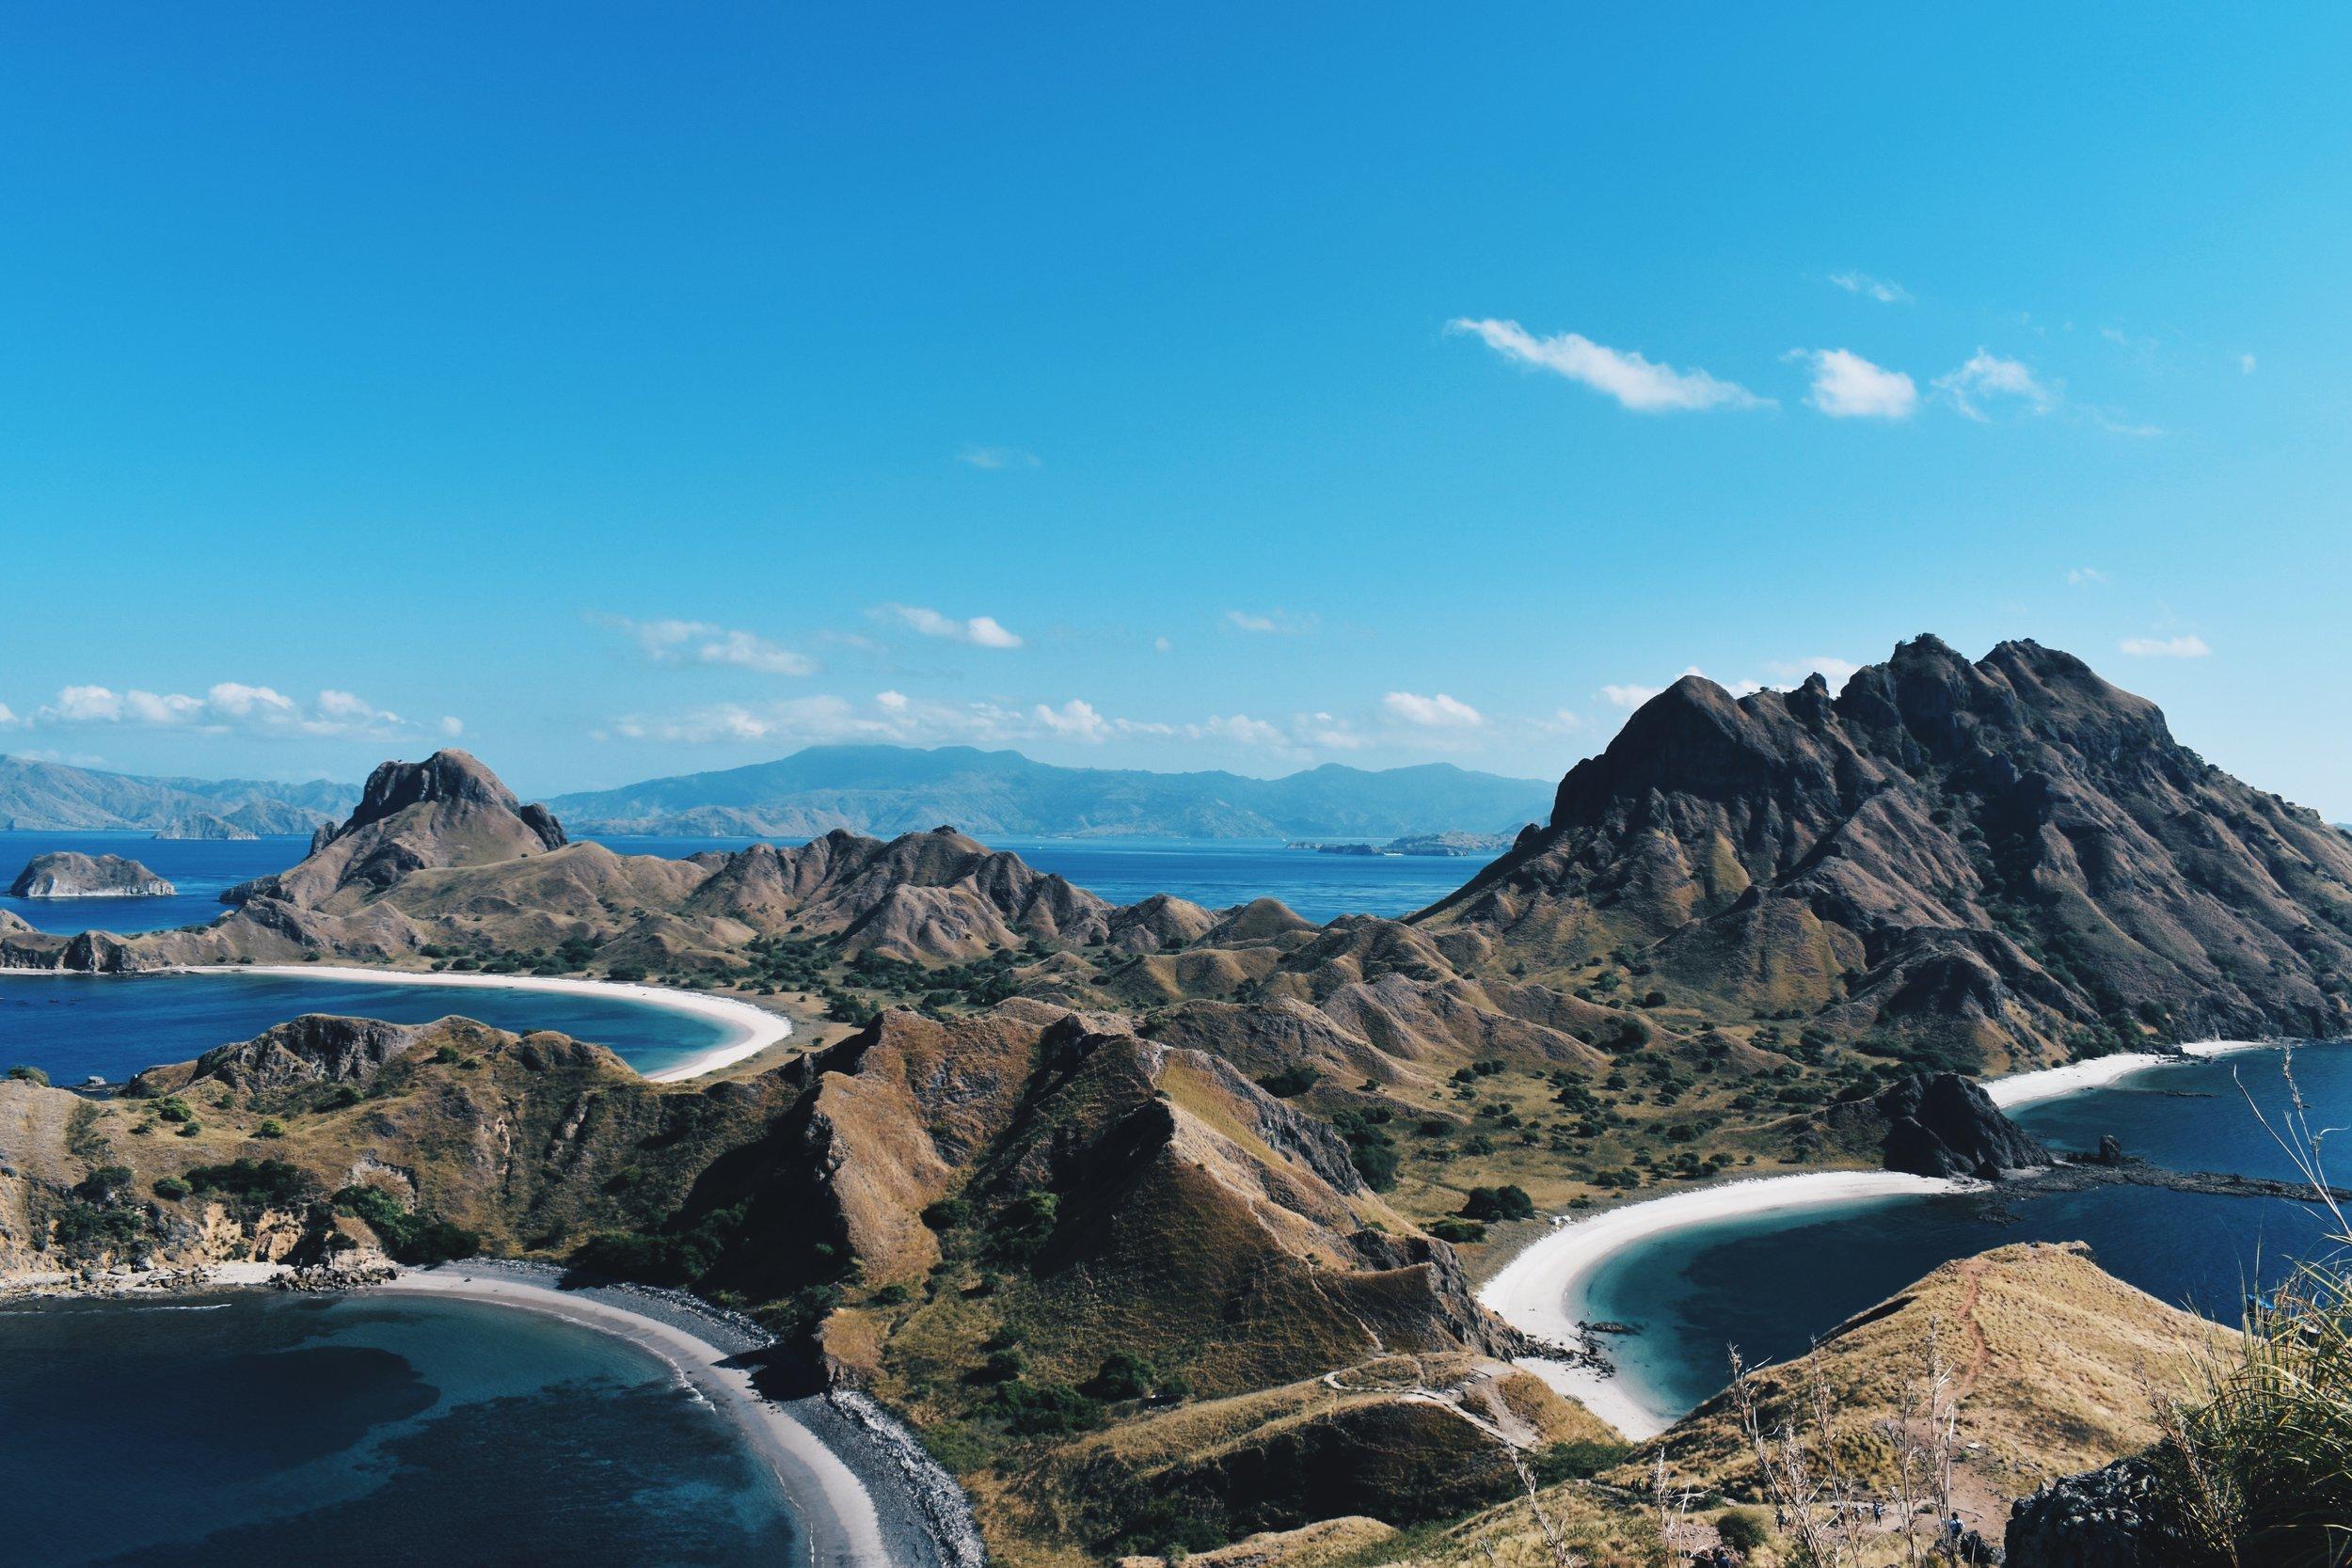 Padar Island was a clear favourite of mine